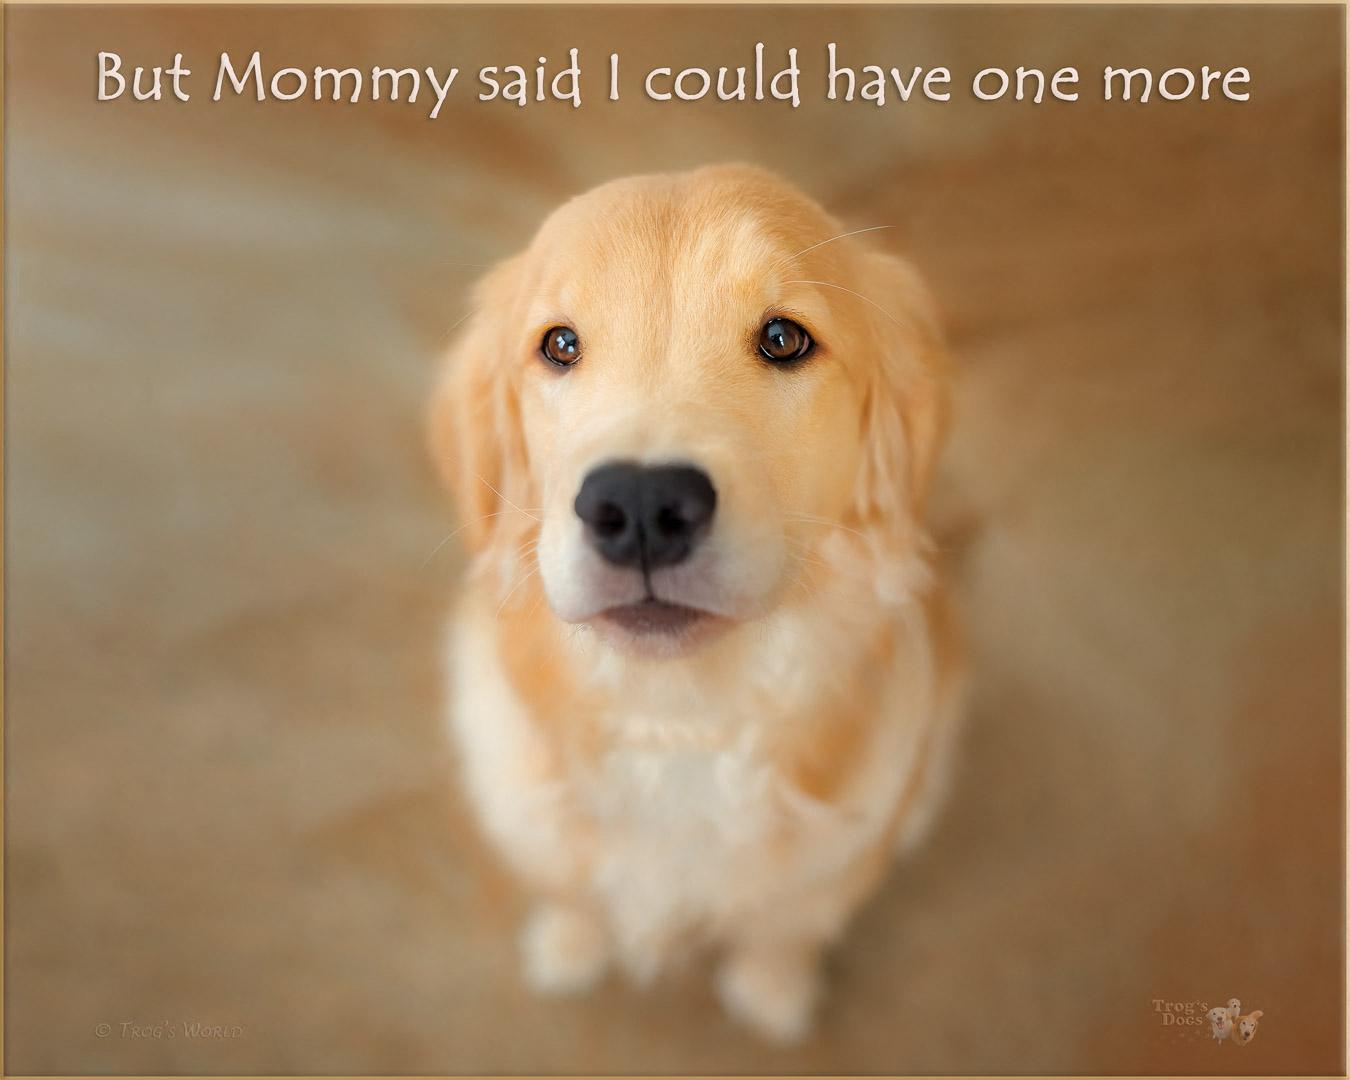 Golden Retriever puppy looking up